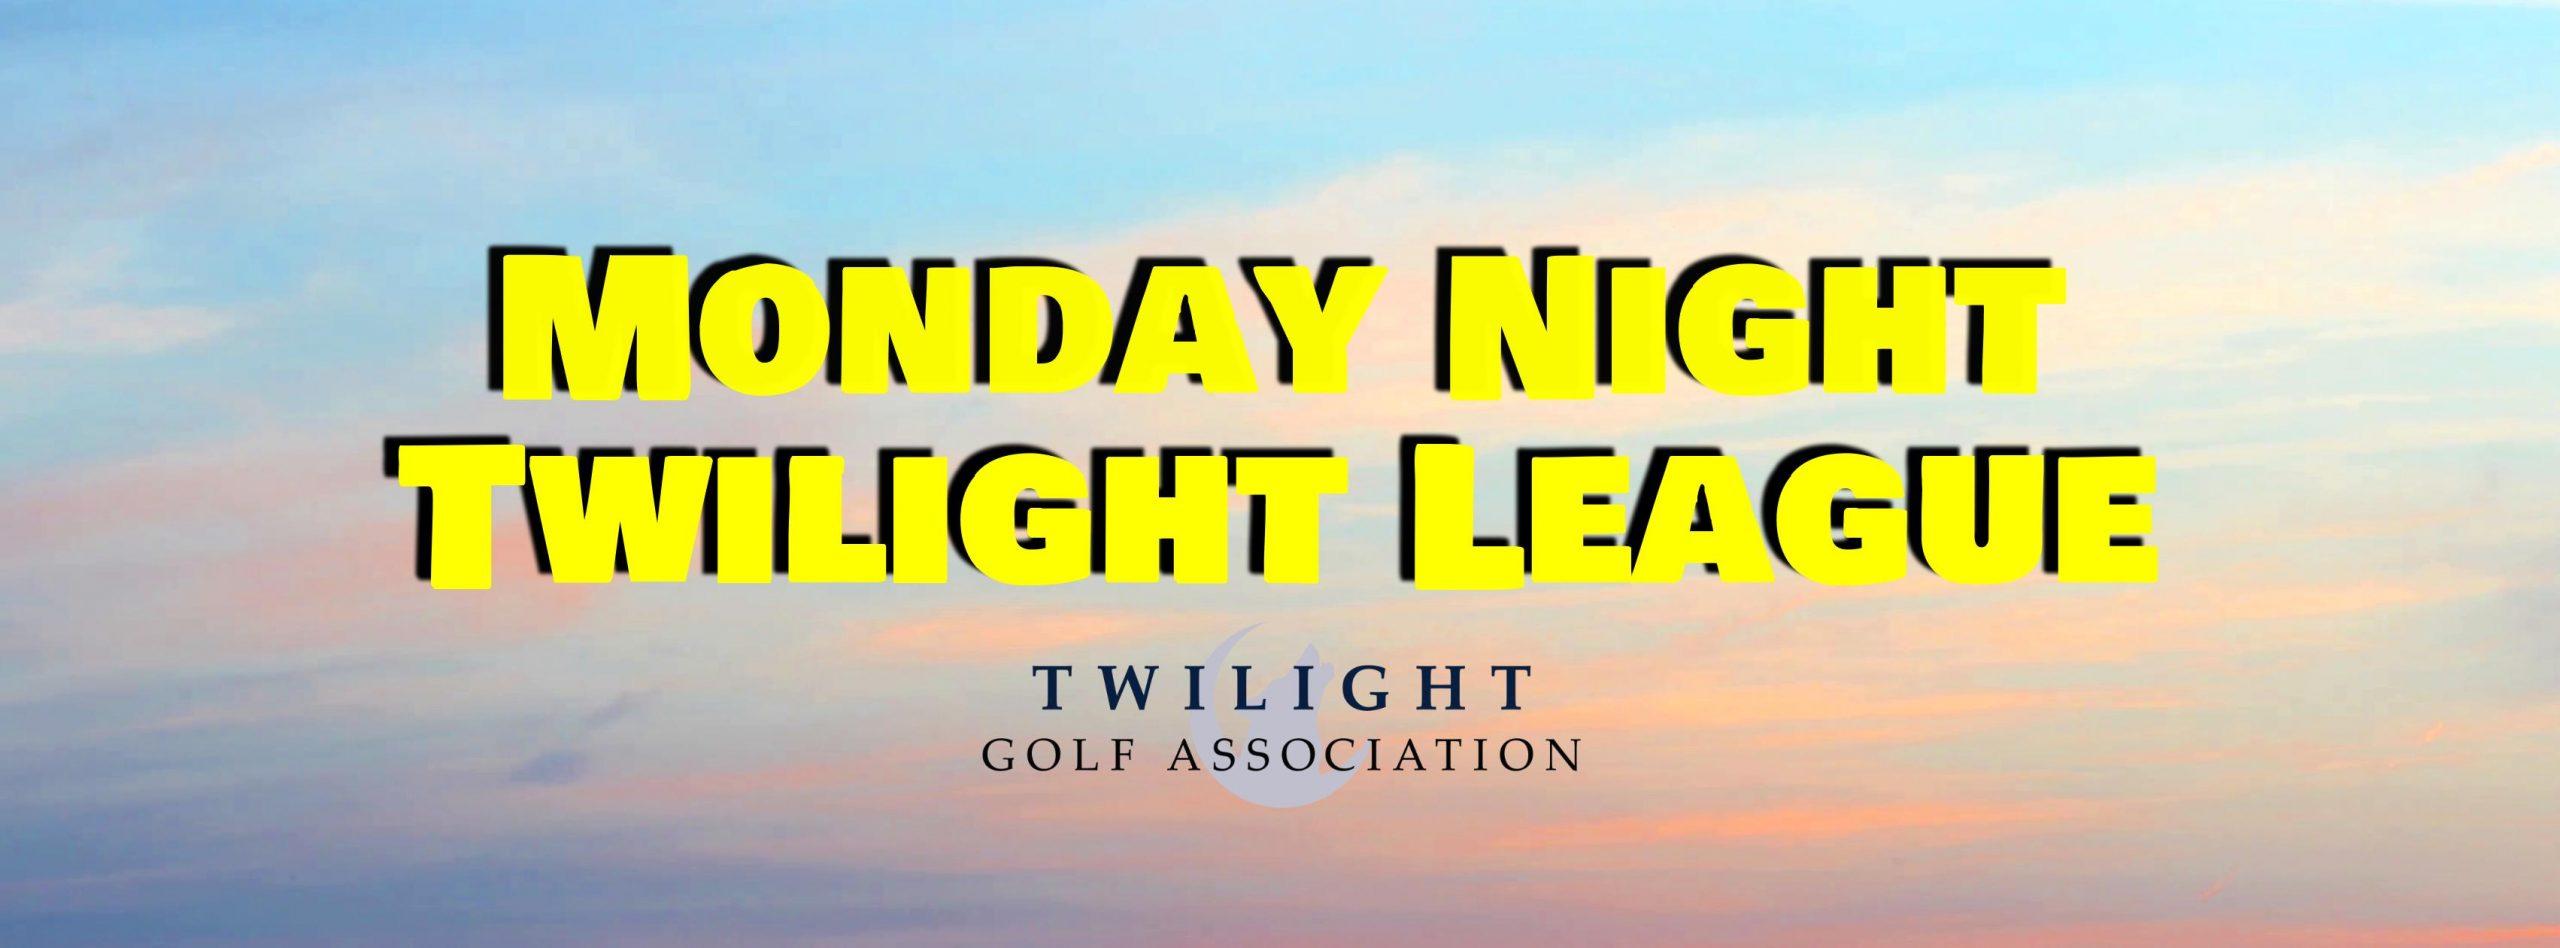 Monday Night Twilight League at Pittsburgh North Golf Club